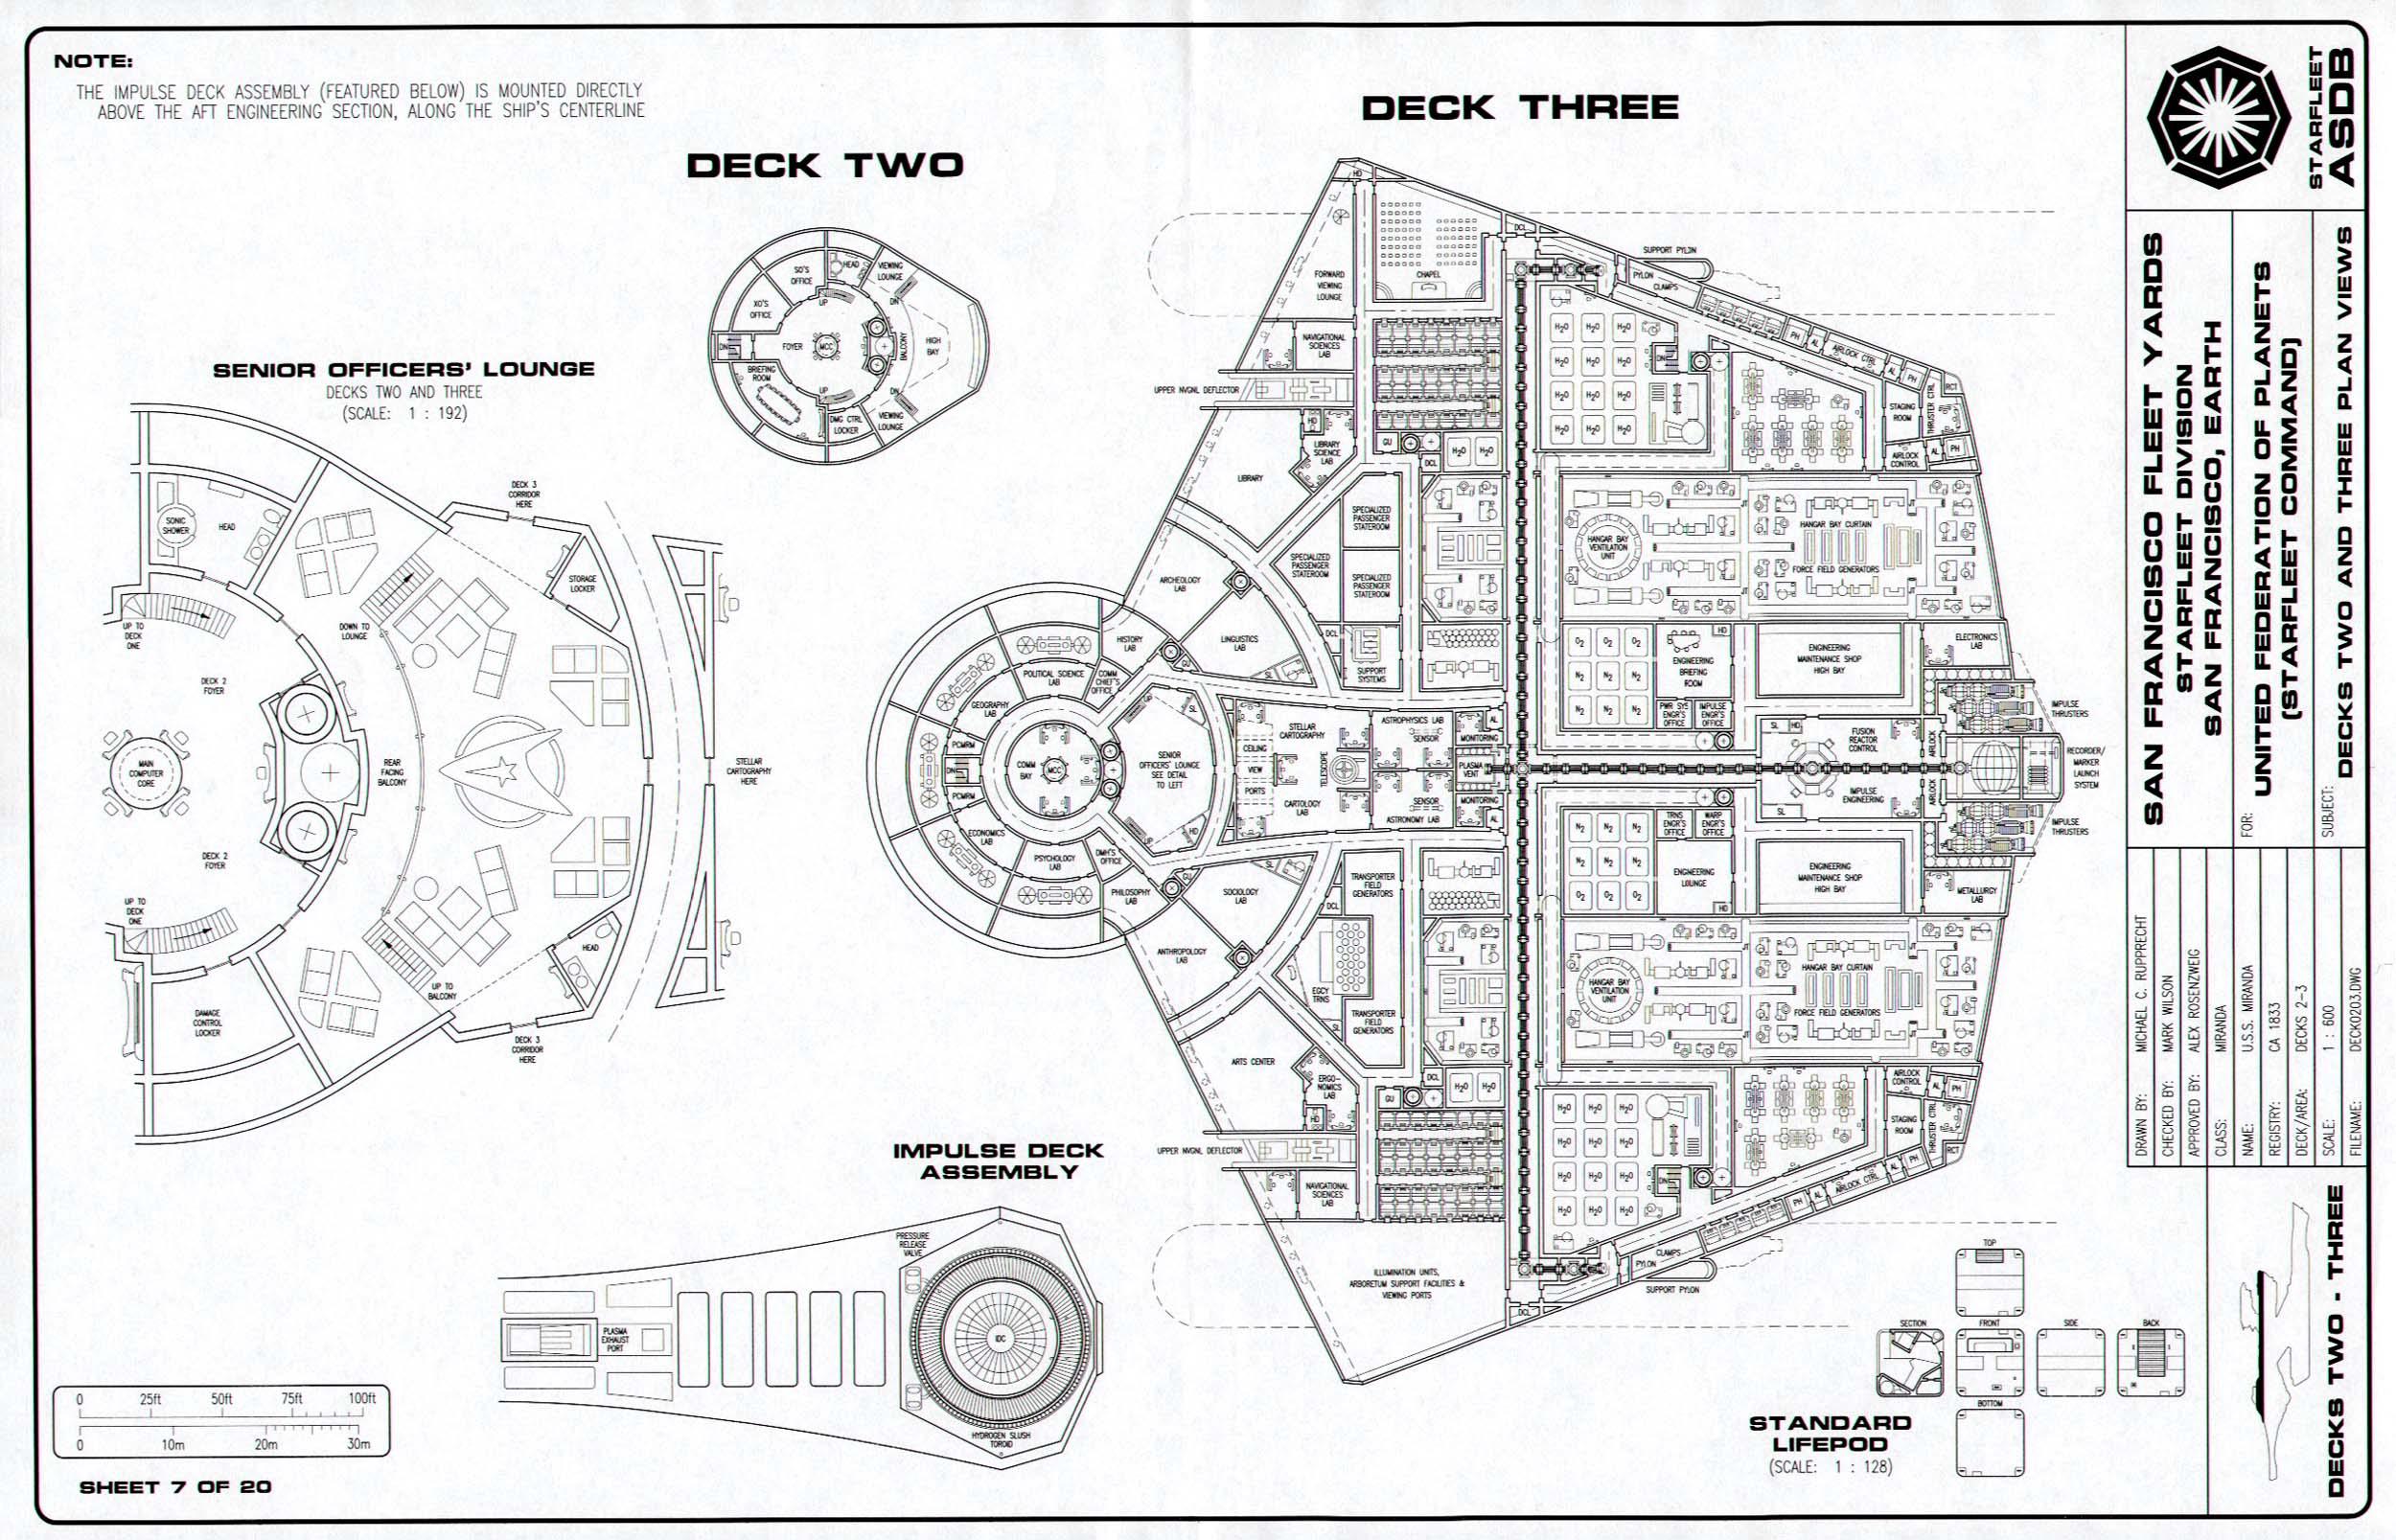 Star Trek Blueprints Miranda Class Cruiser General Plans